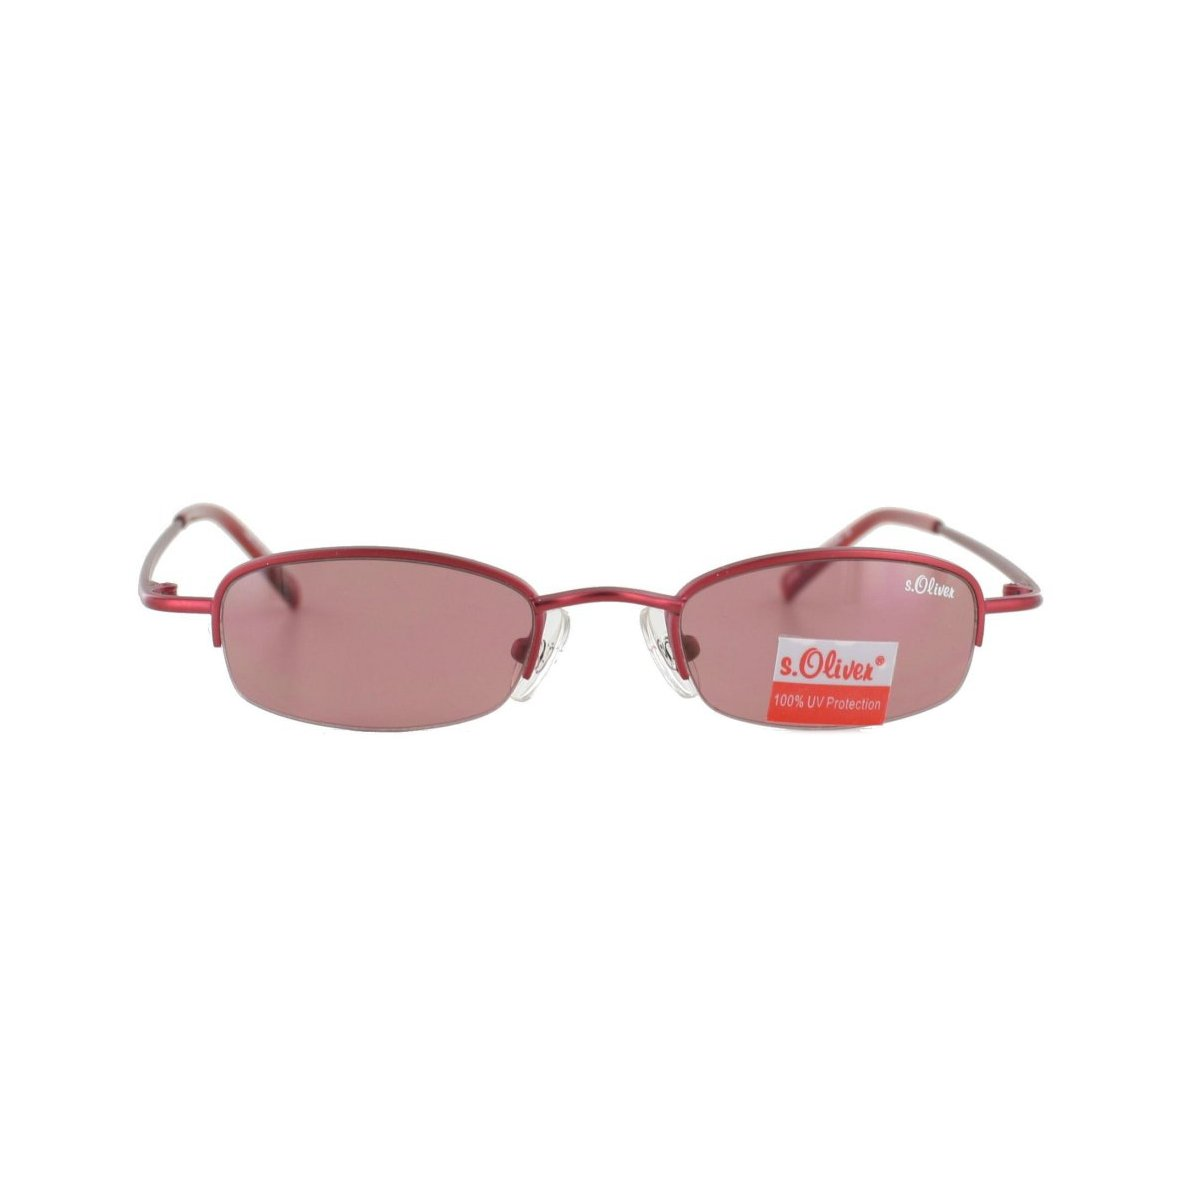 s.oliver Sonnenbrille 4226 C1 black mat Etui NEU